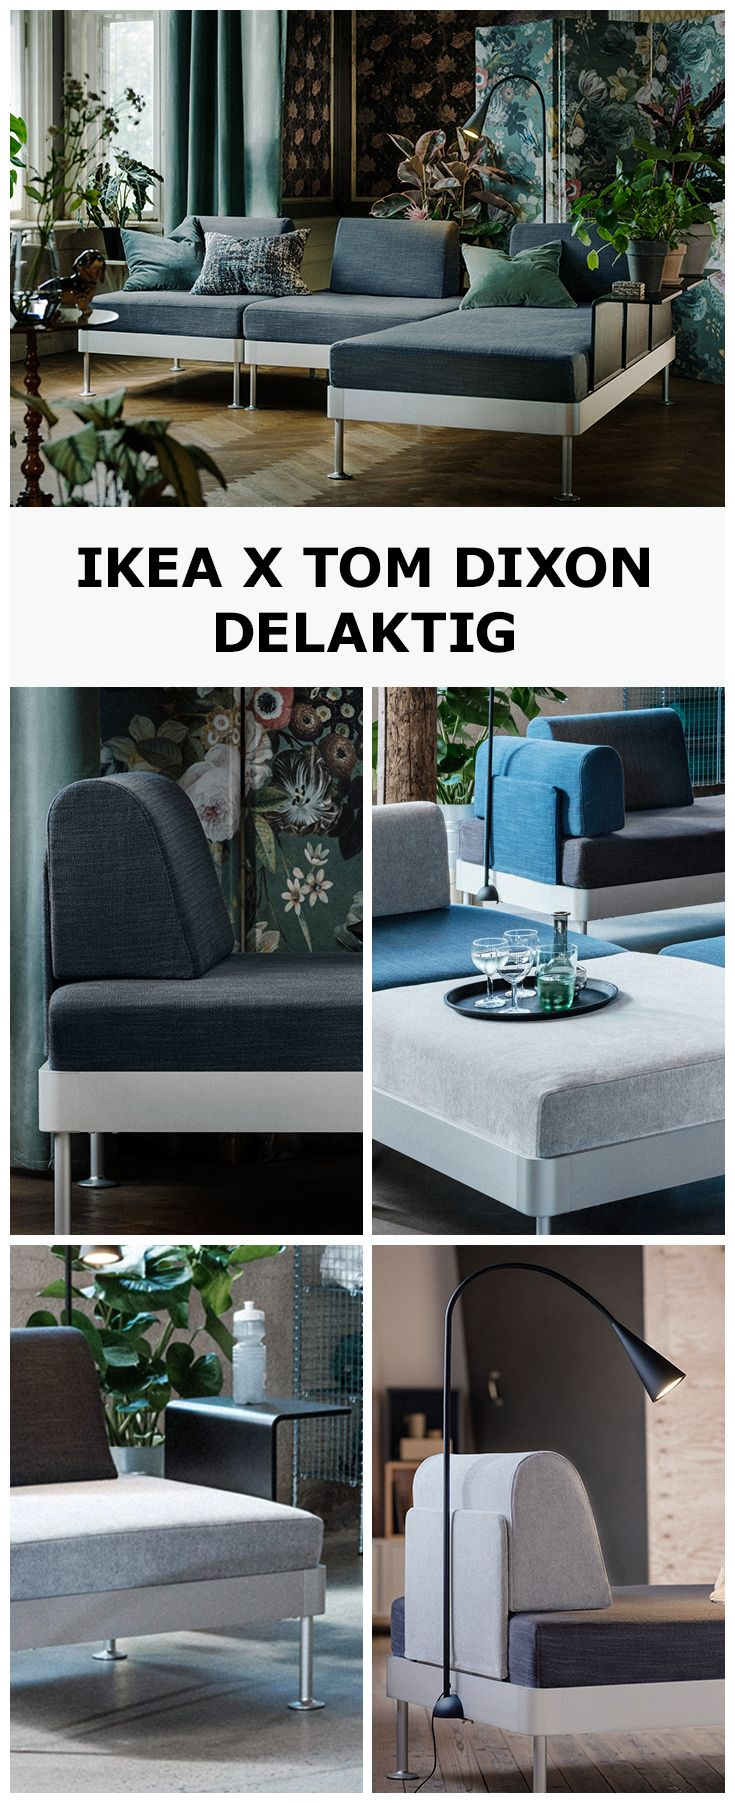 We Ve Teamed Up With British Designer Tom Dixon To Create Delaktig Inspired By Modern Living Delaktig Adapts To Wh Attic Renovation Attic Rooms Attic Remodel